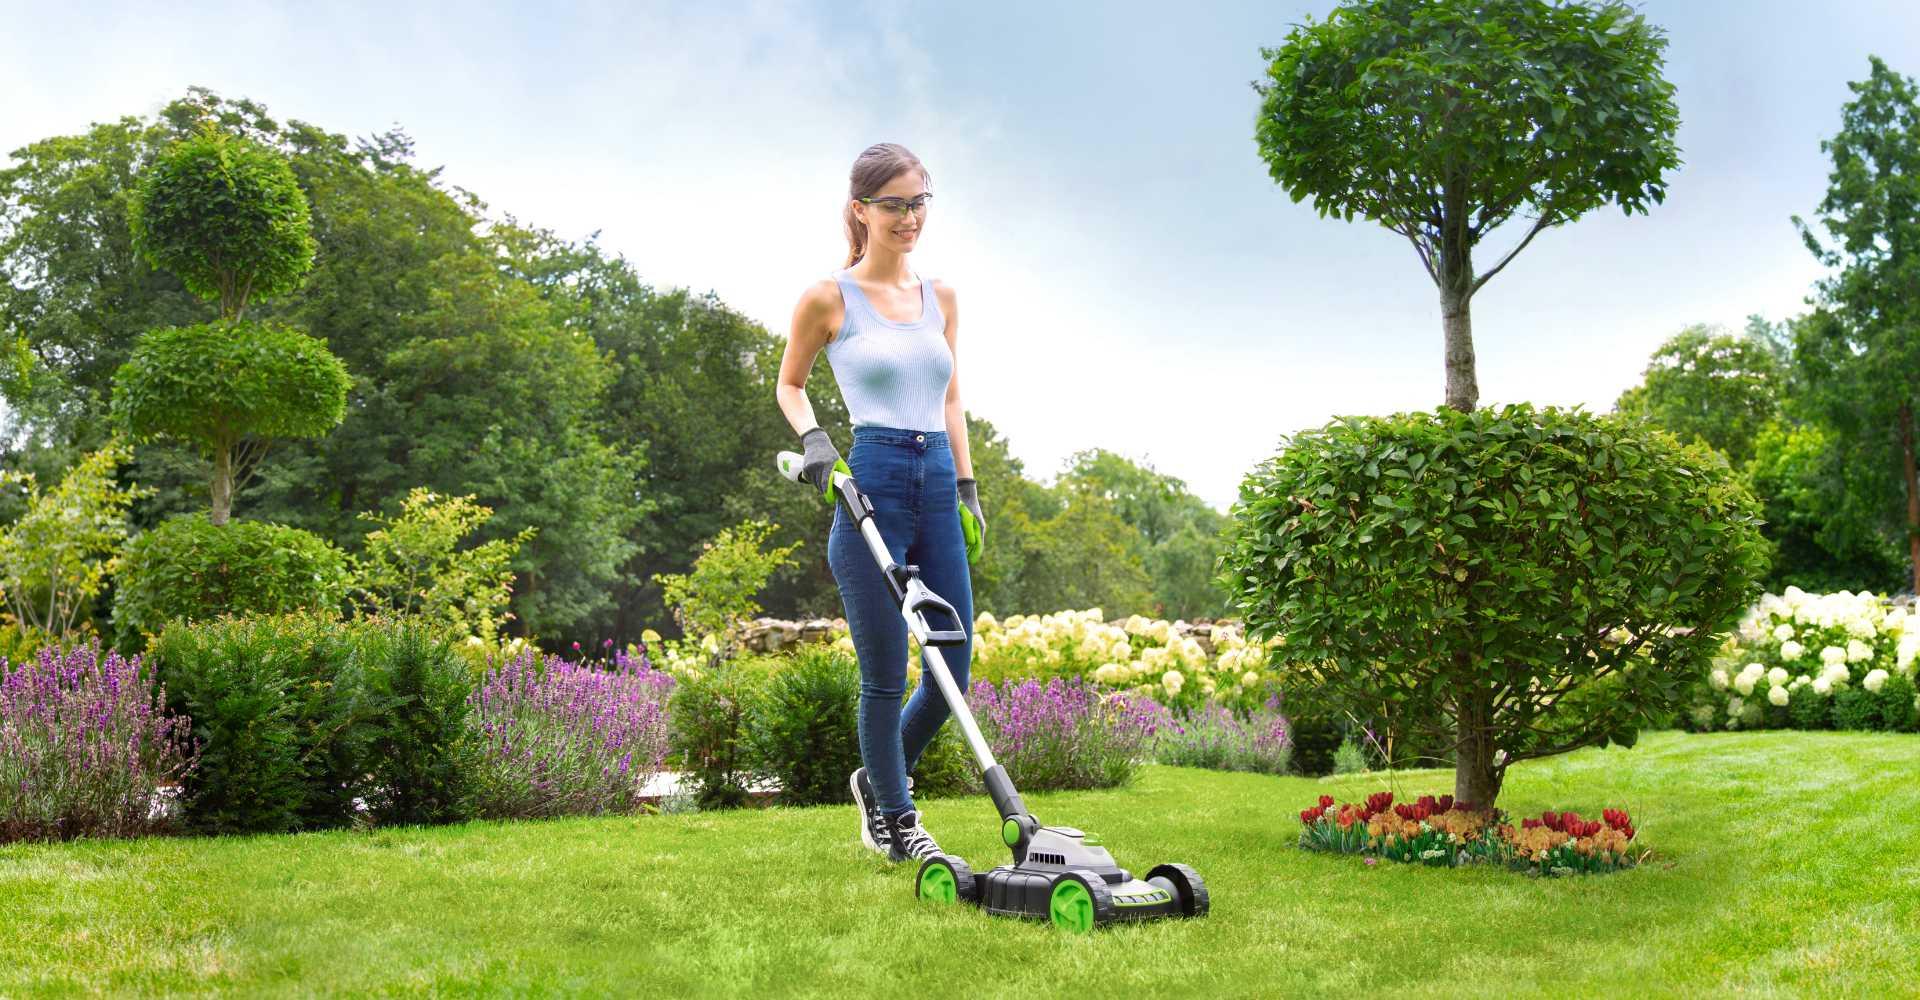 Woman using mini lawnmower in garden